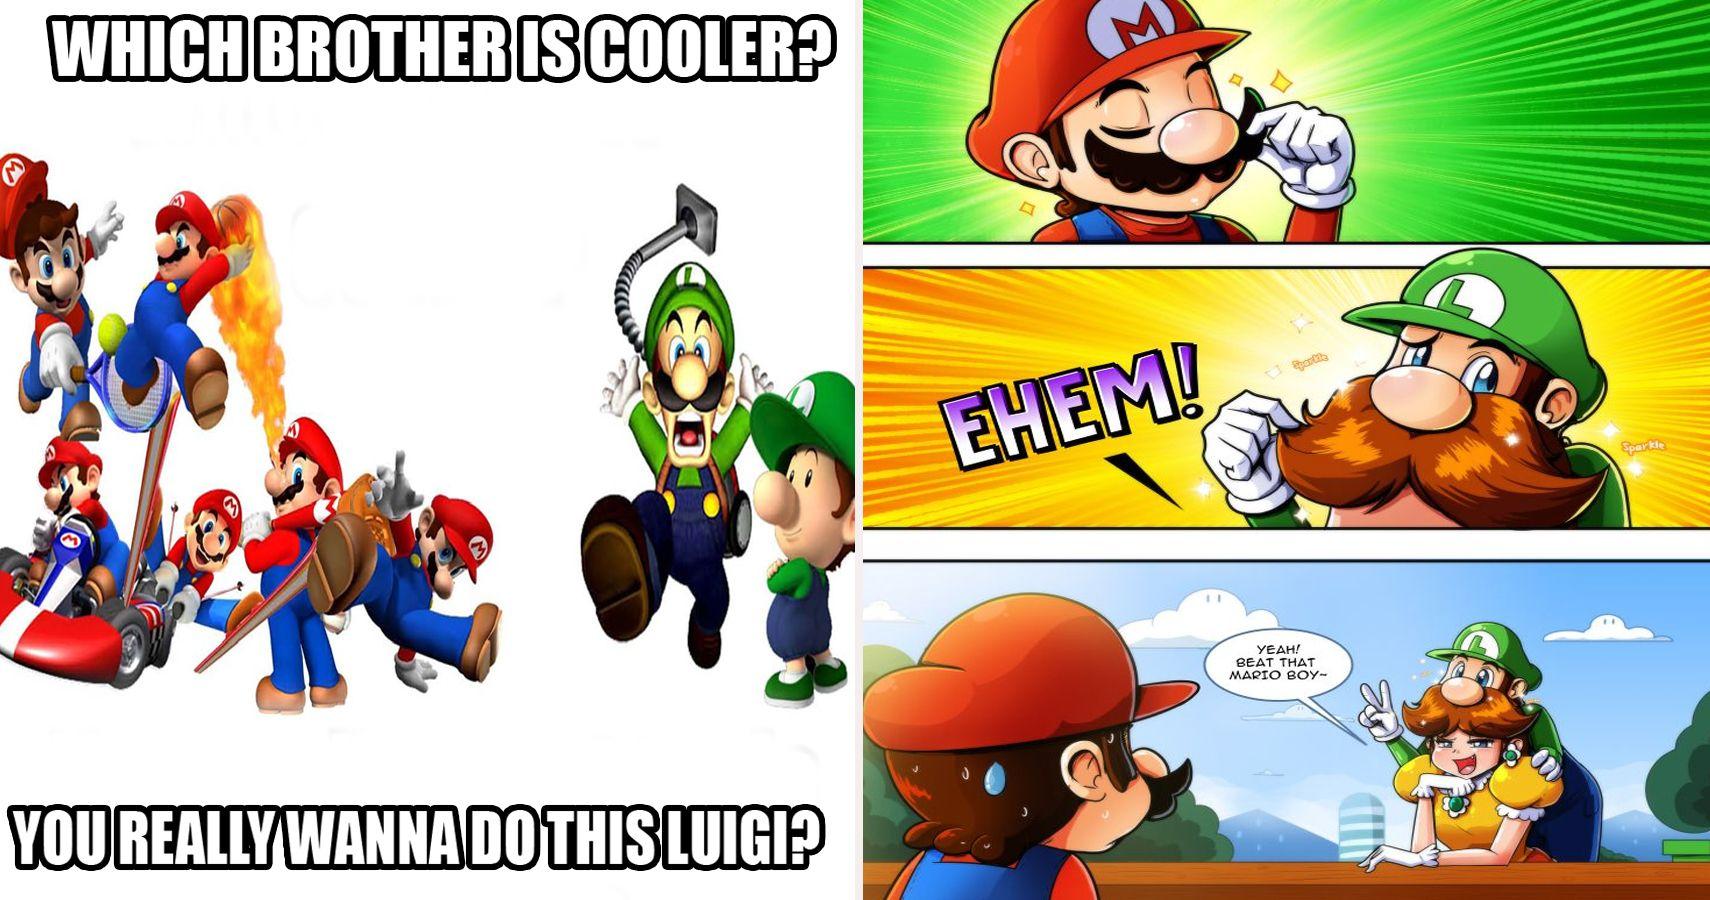 Family Feud 25 Hilarious Mario Vs Luigi Memes That Make Fans Choose